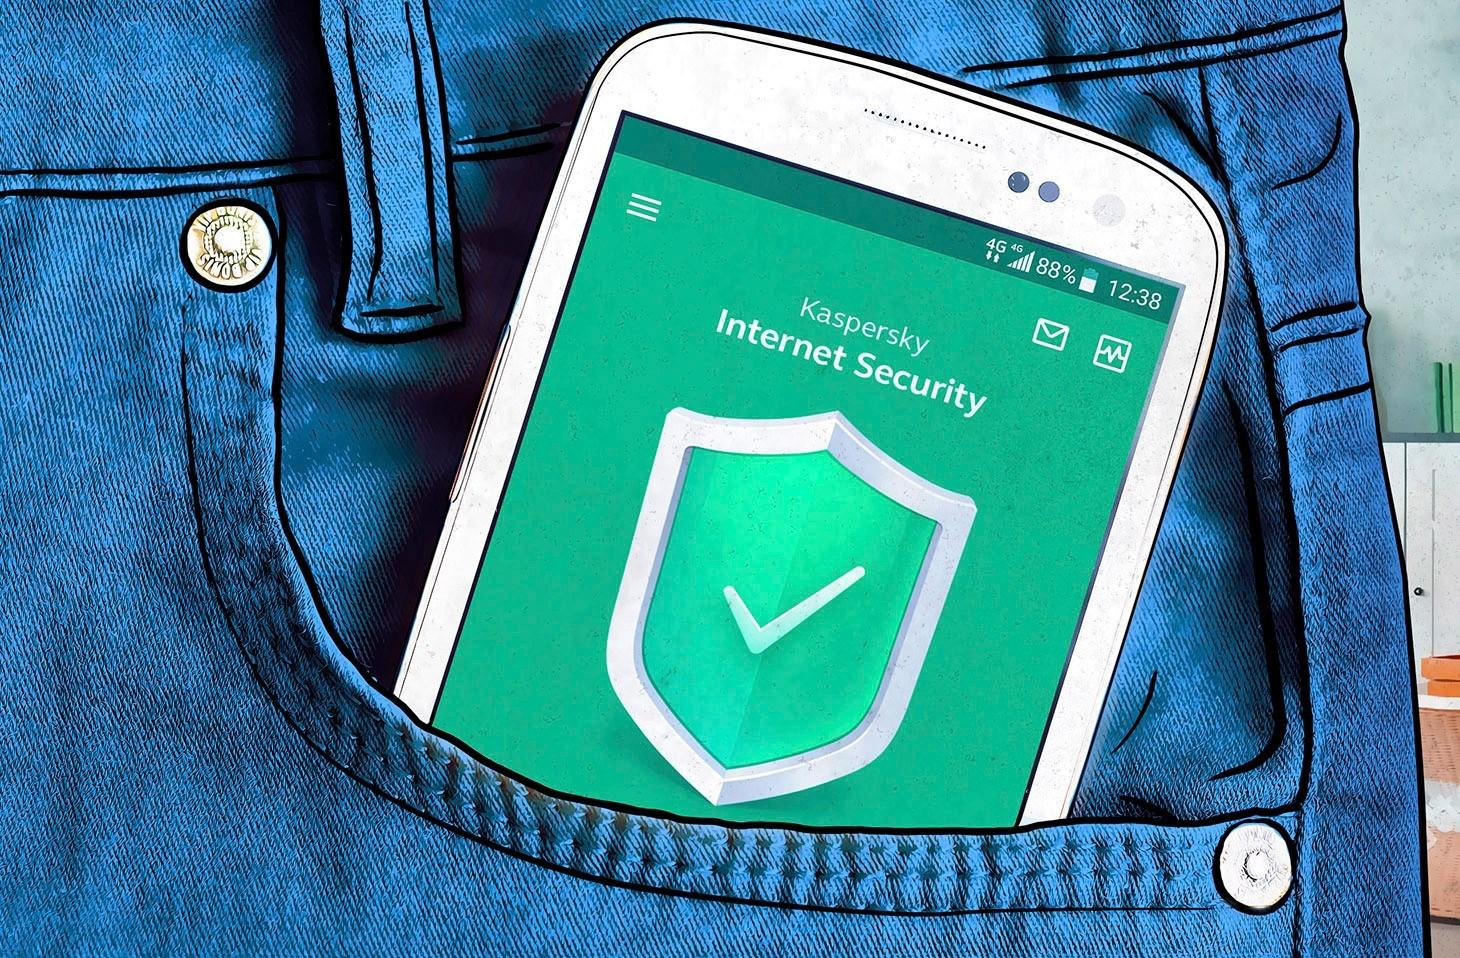 Miglior antivirus per Samsung Galaxy J2, J2 Prime, J5 e J7 1